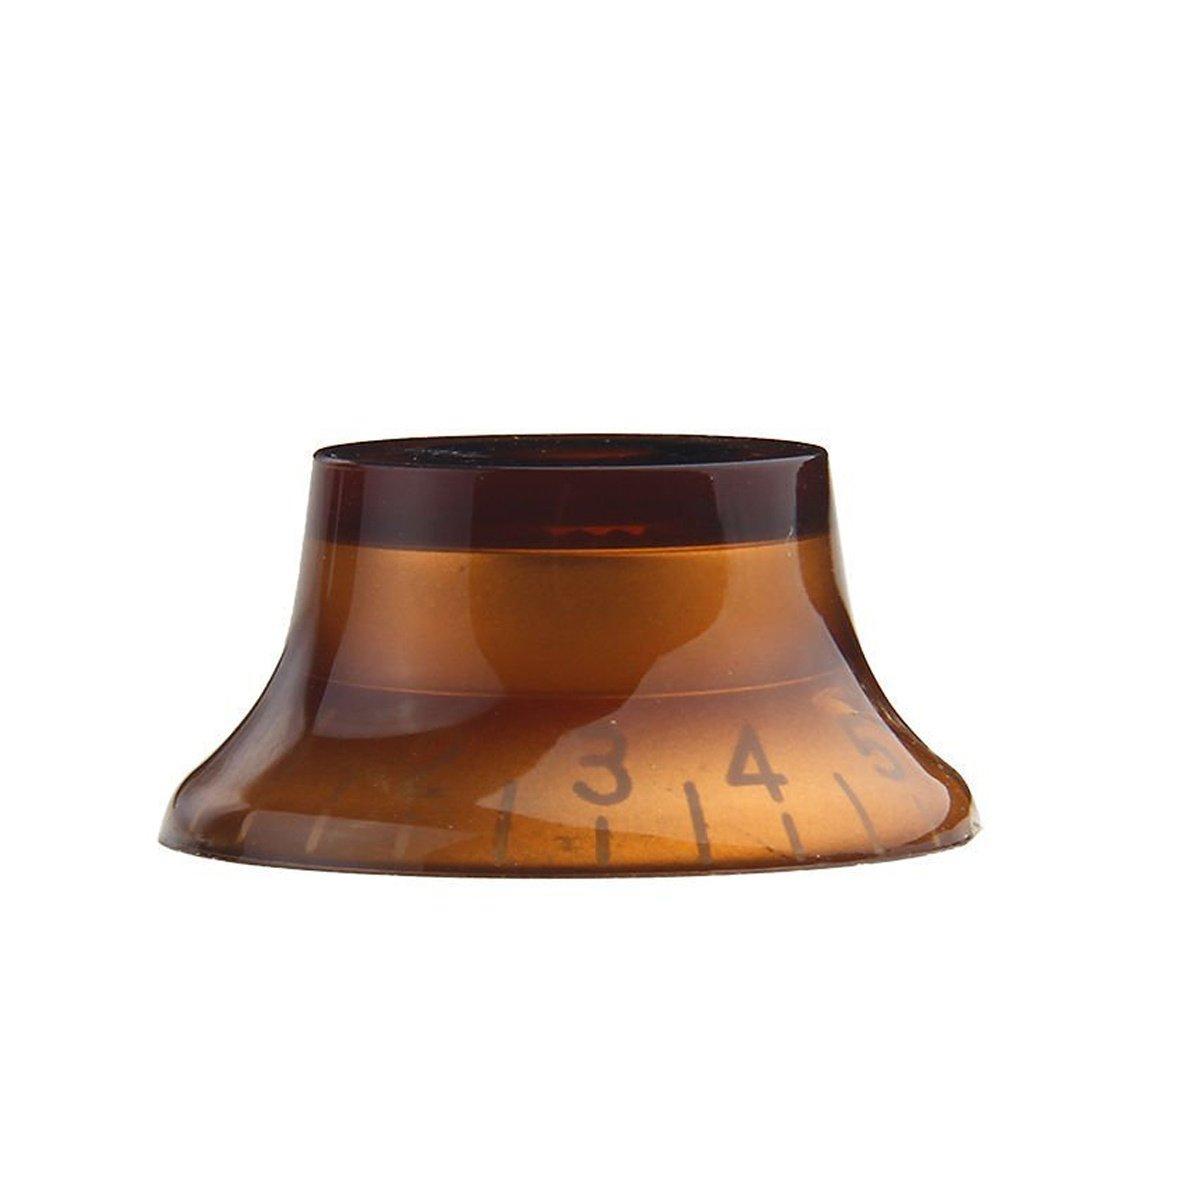 Musiclily Metrica 6mm Plastica Manopole Top Hat Knobs per Chitarra Tipo Gibson LP Oro 4 Pezzi